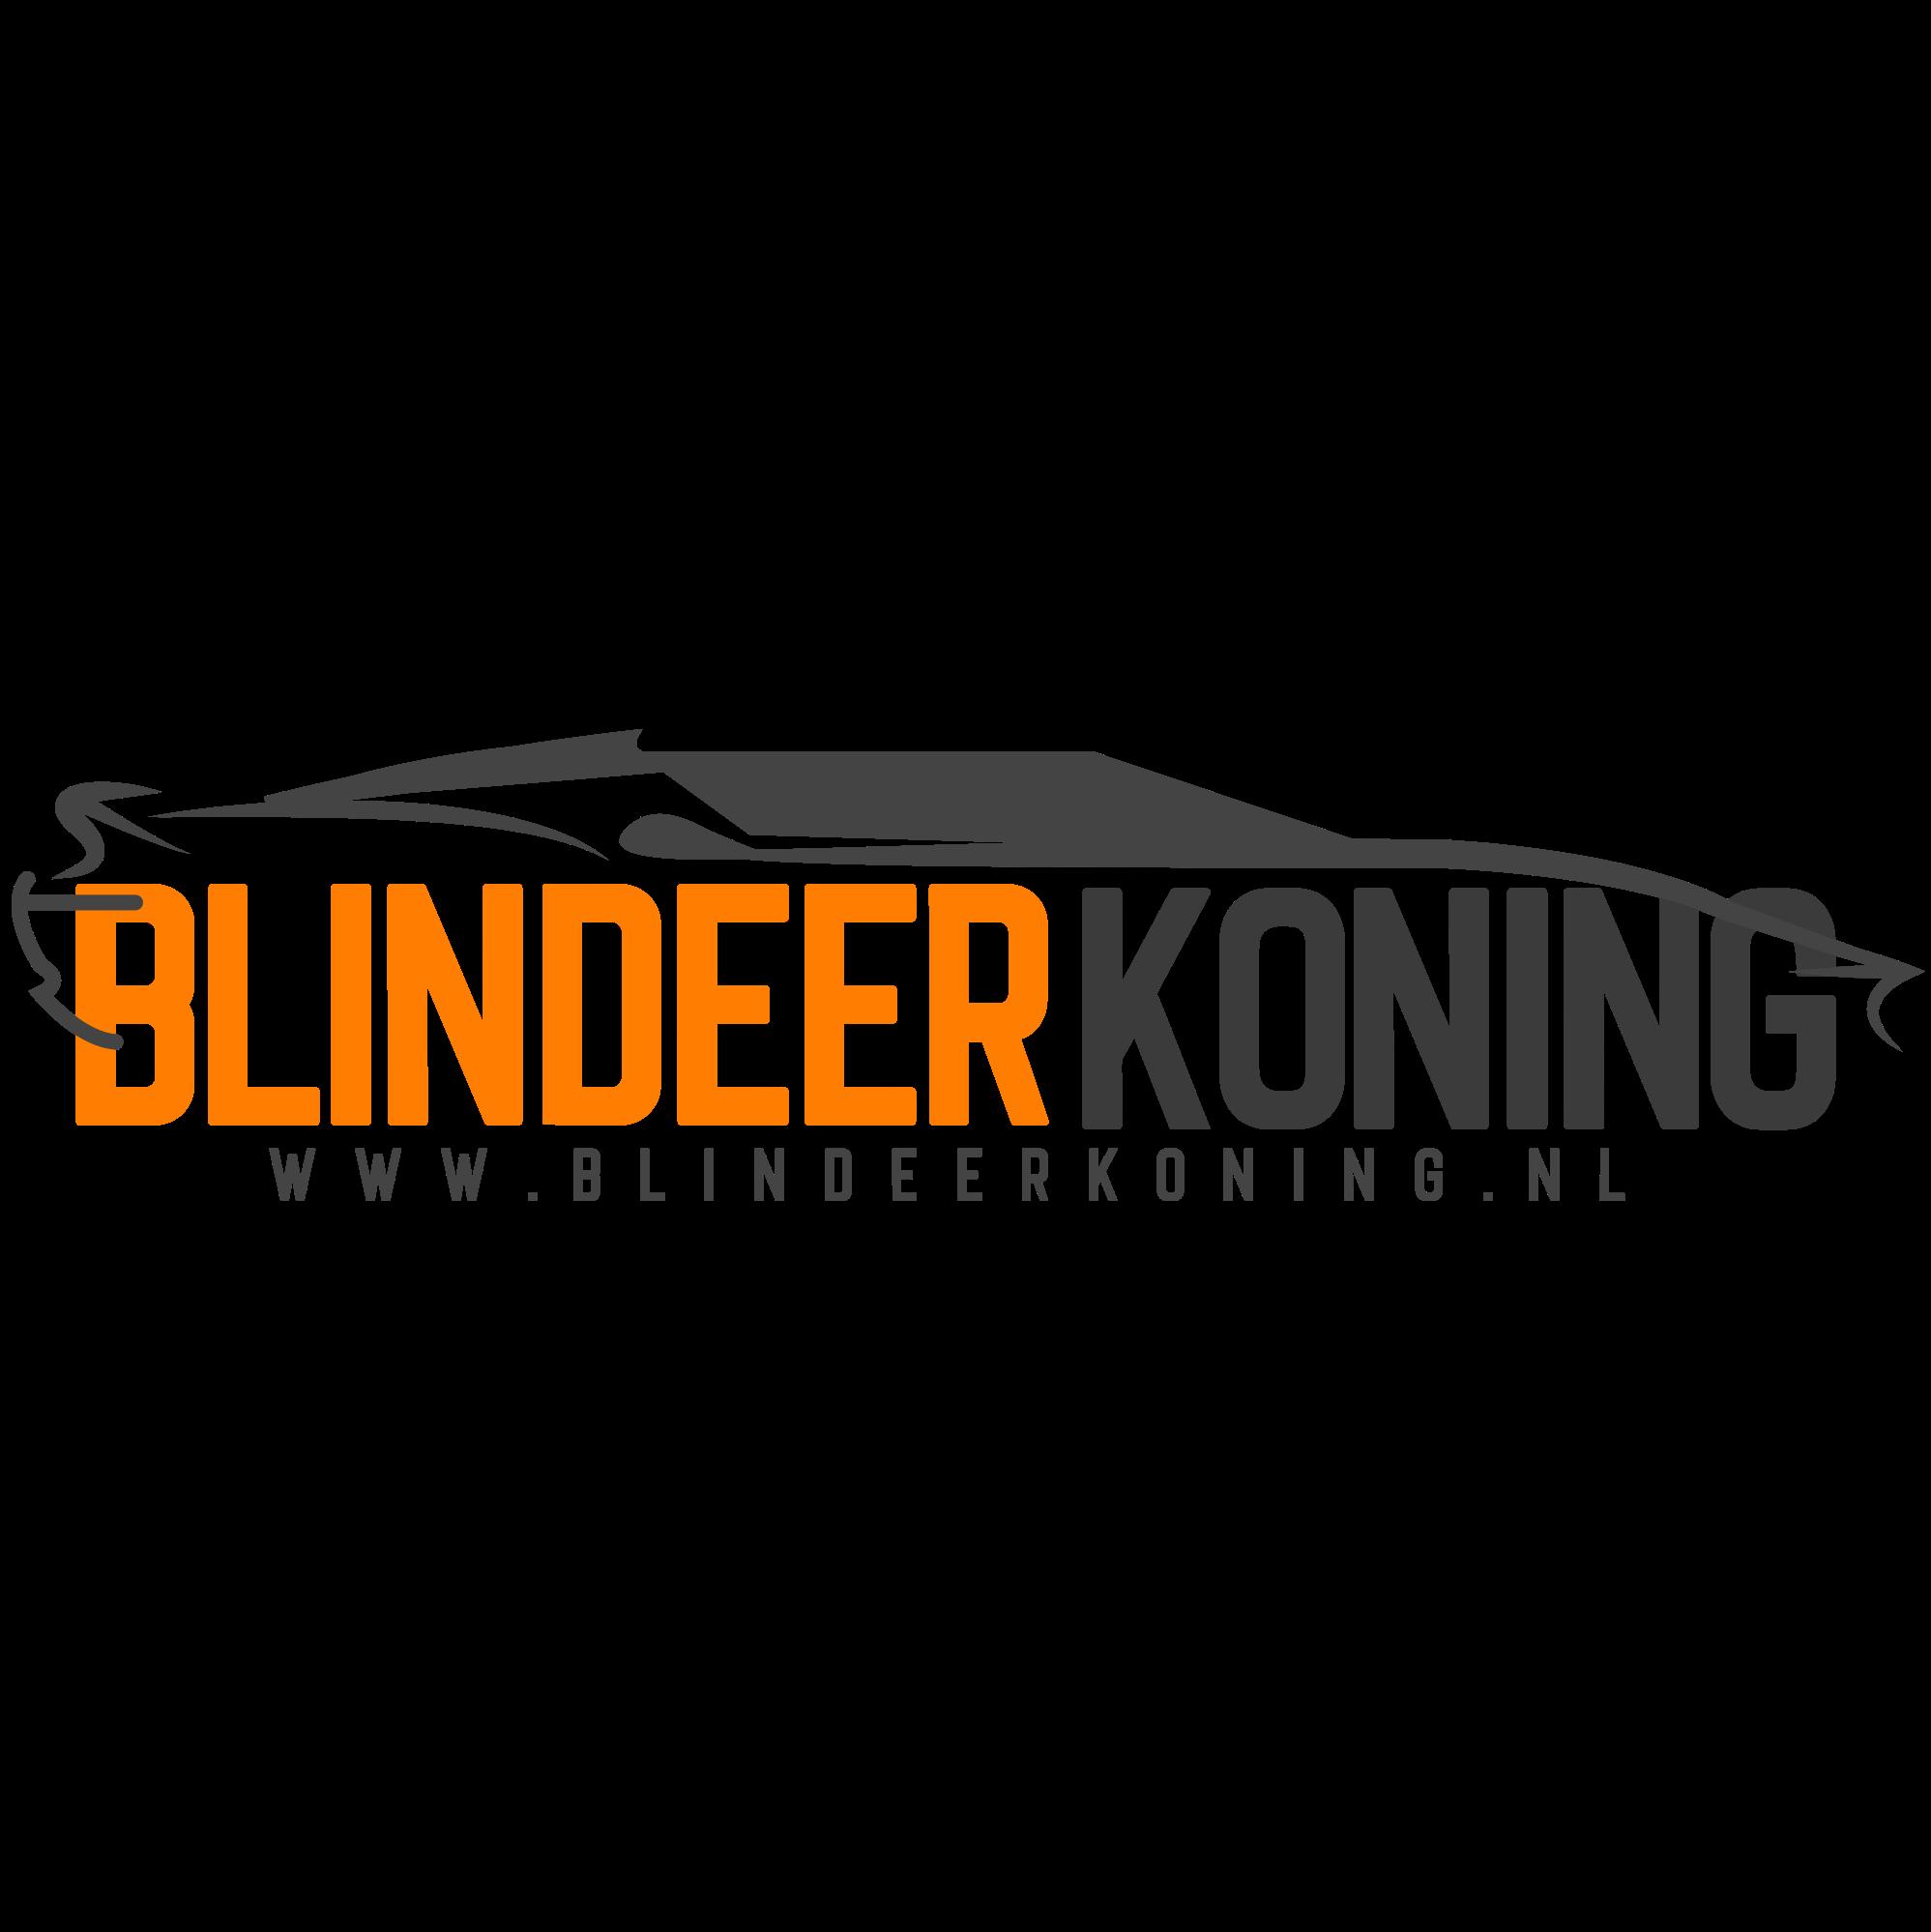 Blindeerkoning